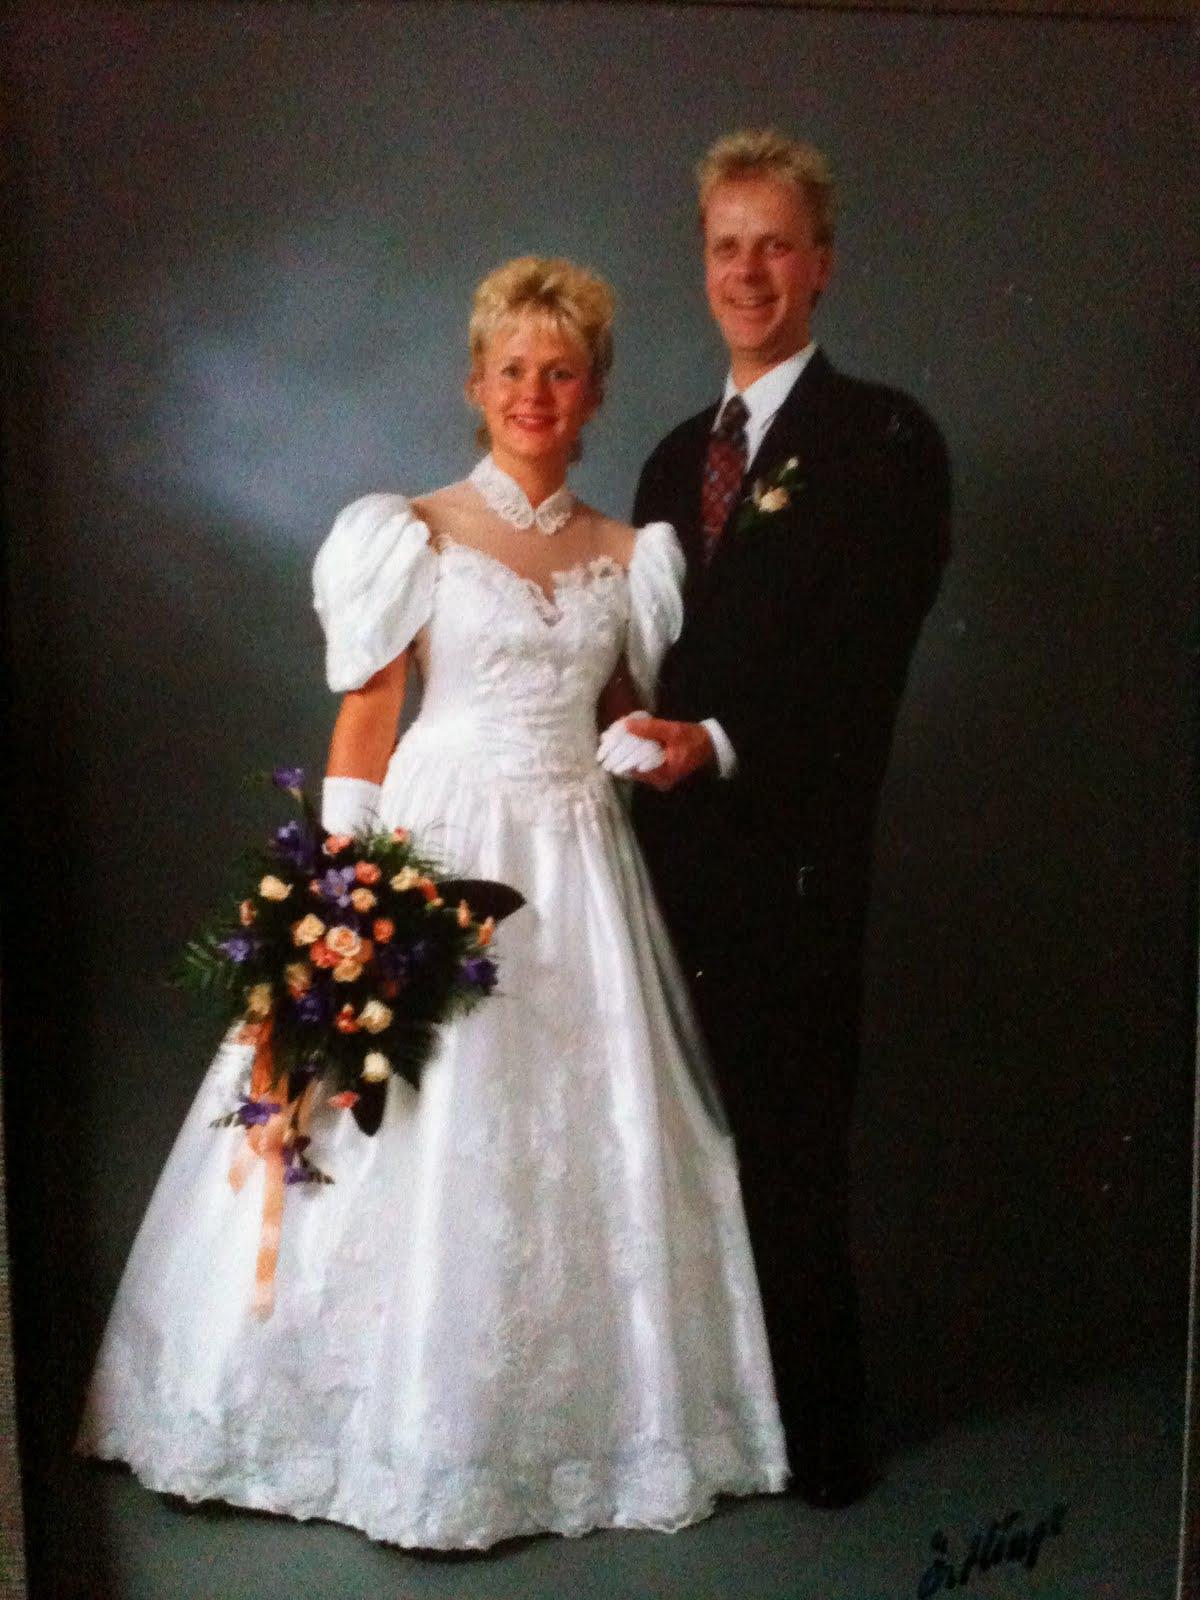 Dejting 20 år bröllopsdag